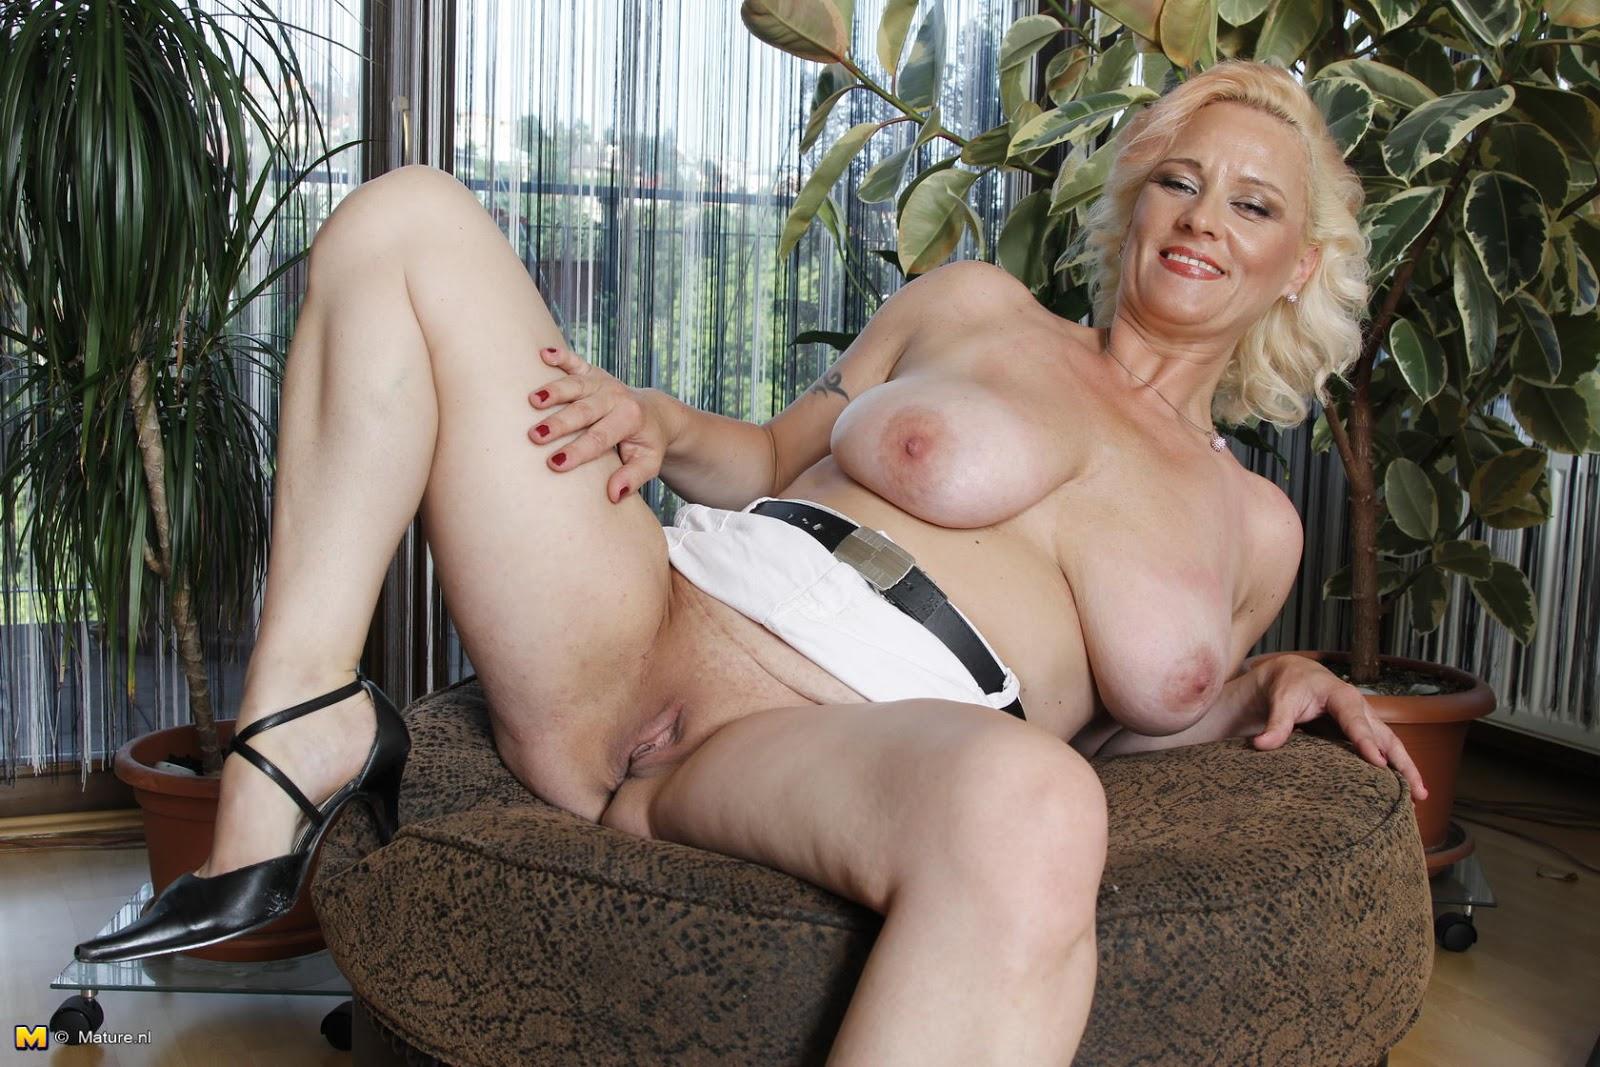 Nude sex strip gifs